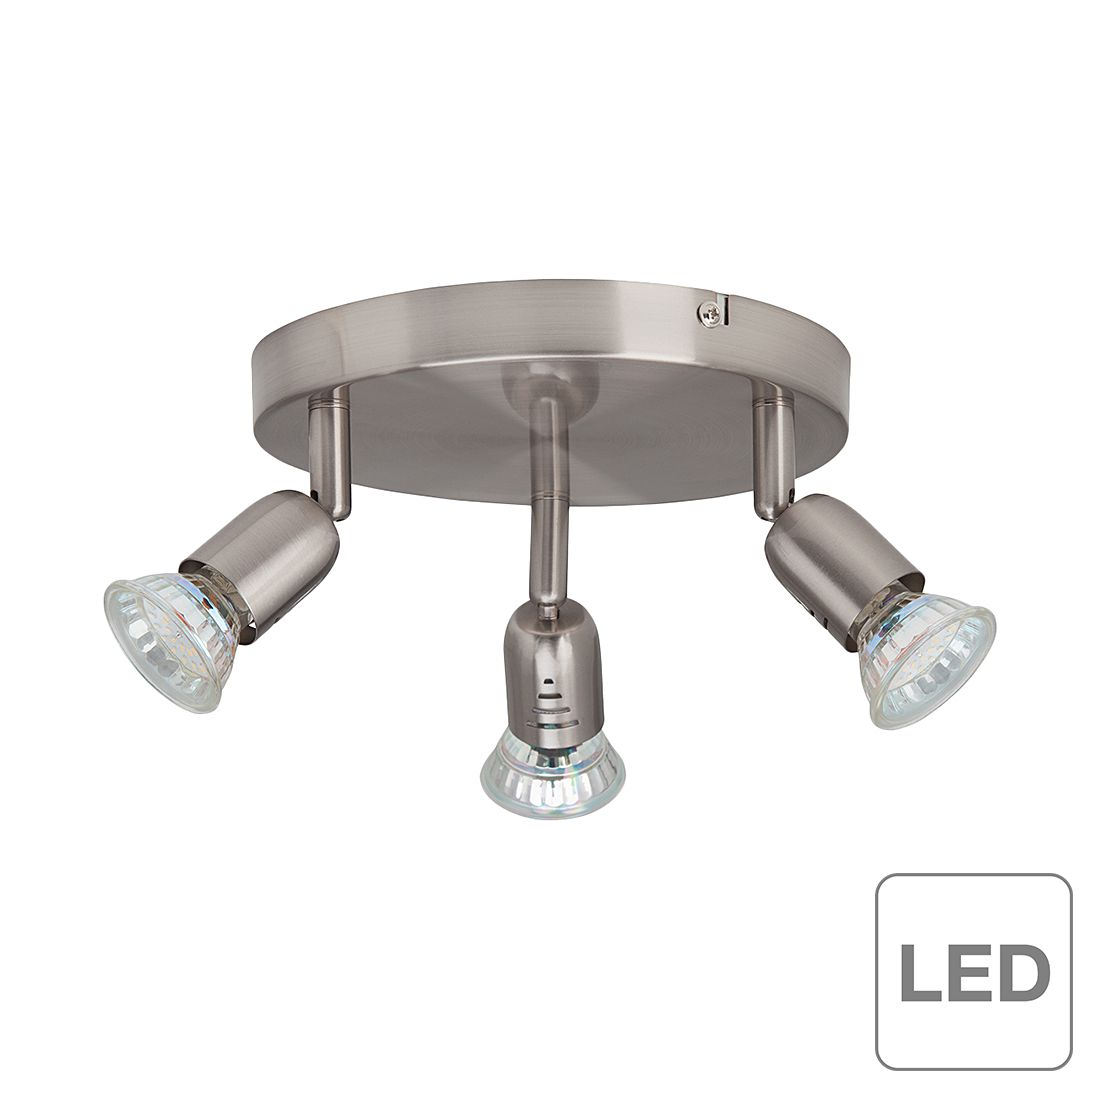 Brilliant Deckenleuchte Loona LED Modern Edelstahl Silber Ø 19 cm 3-flammig GU10 2W inkl. Leuchtmittel, Brilliant